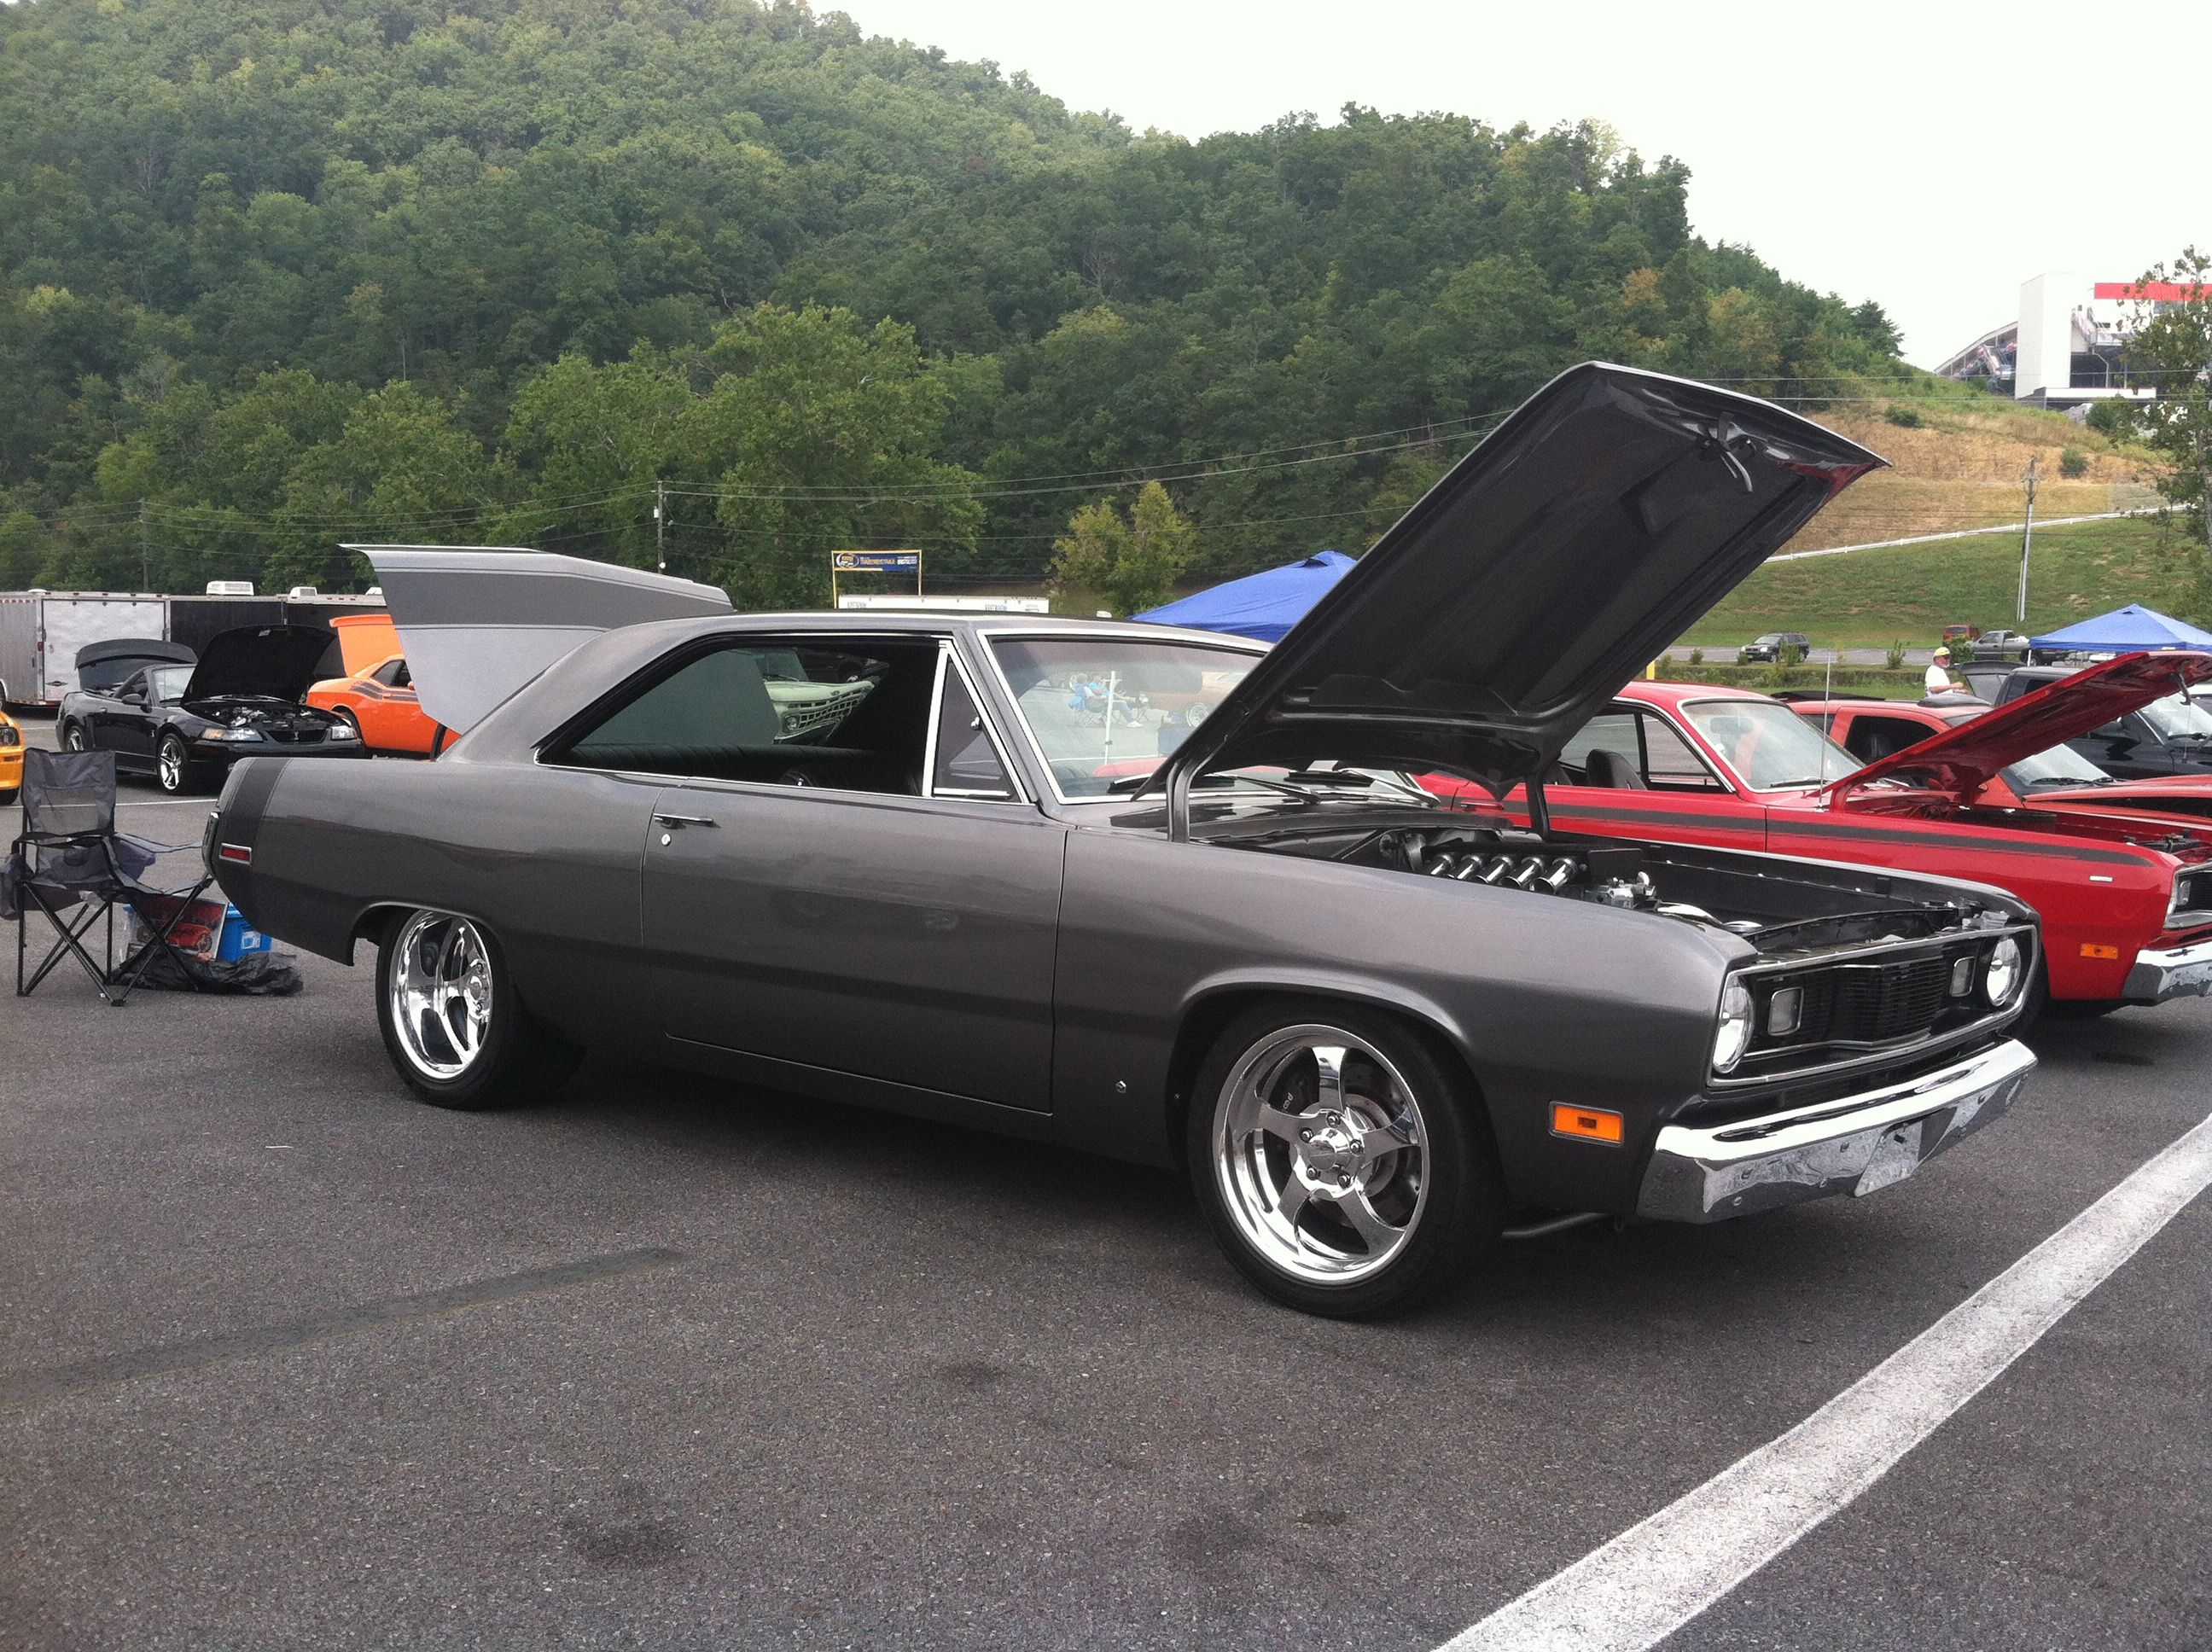 Custom scamp | Mopar muscle cars, Plymouth scamp, Mopar cars